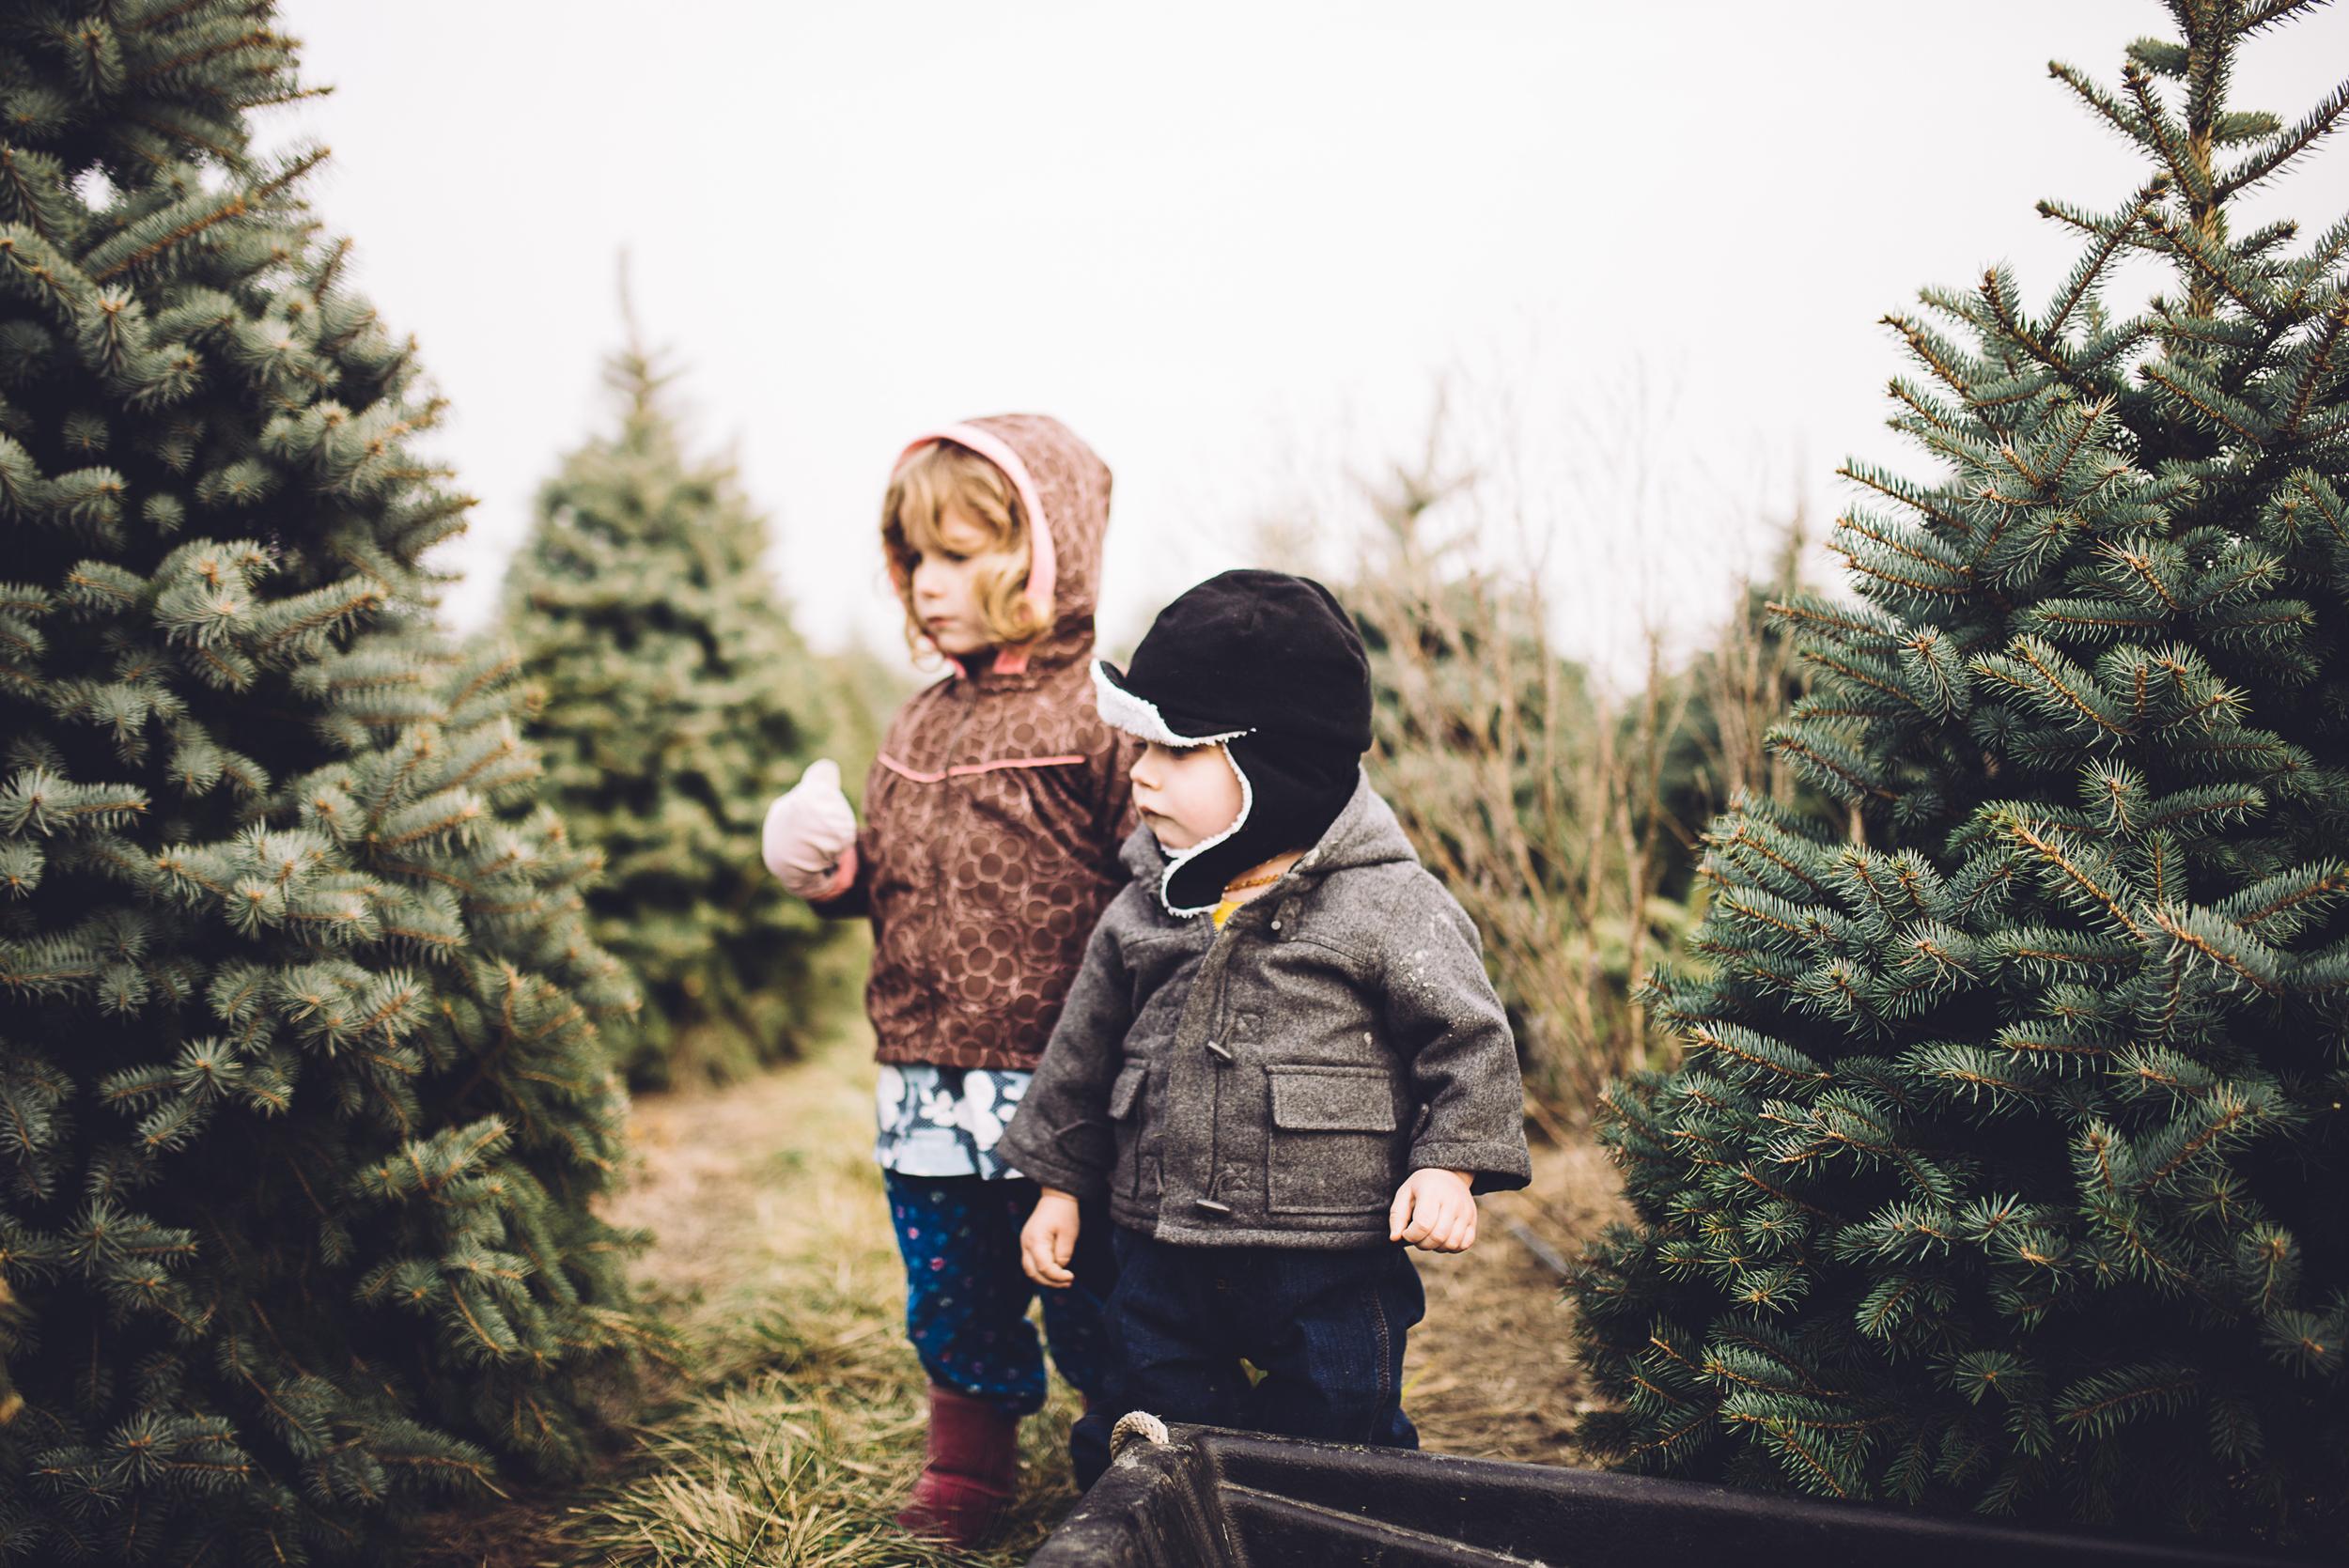 christmas-tree-cutting-8.jpg